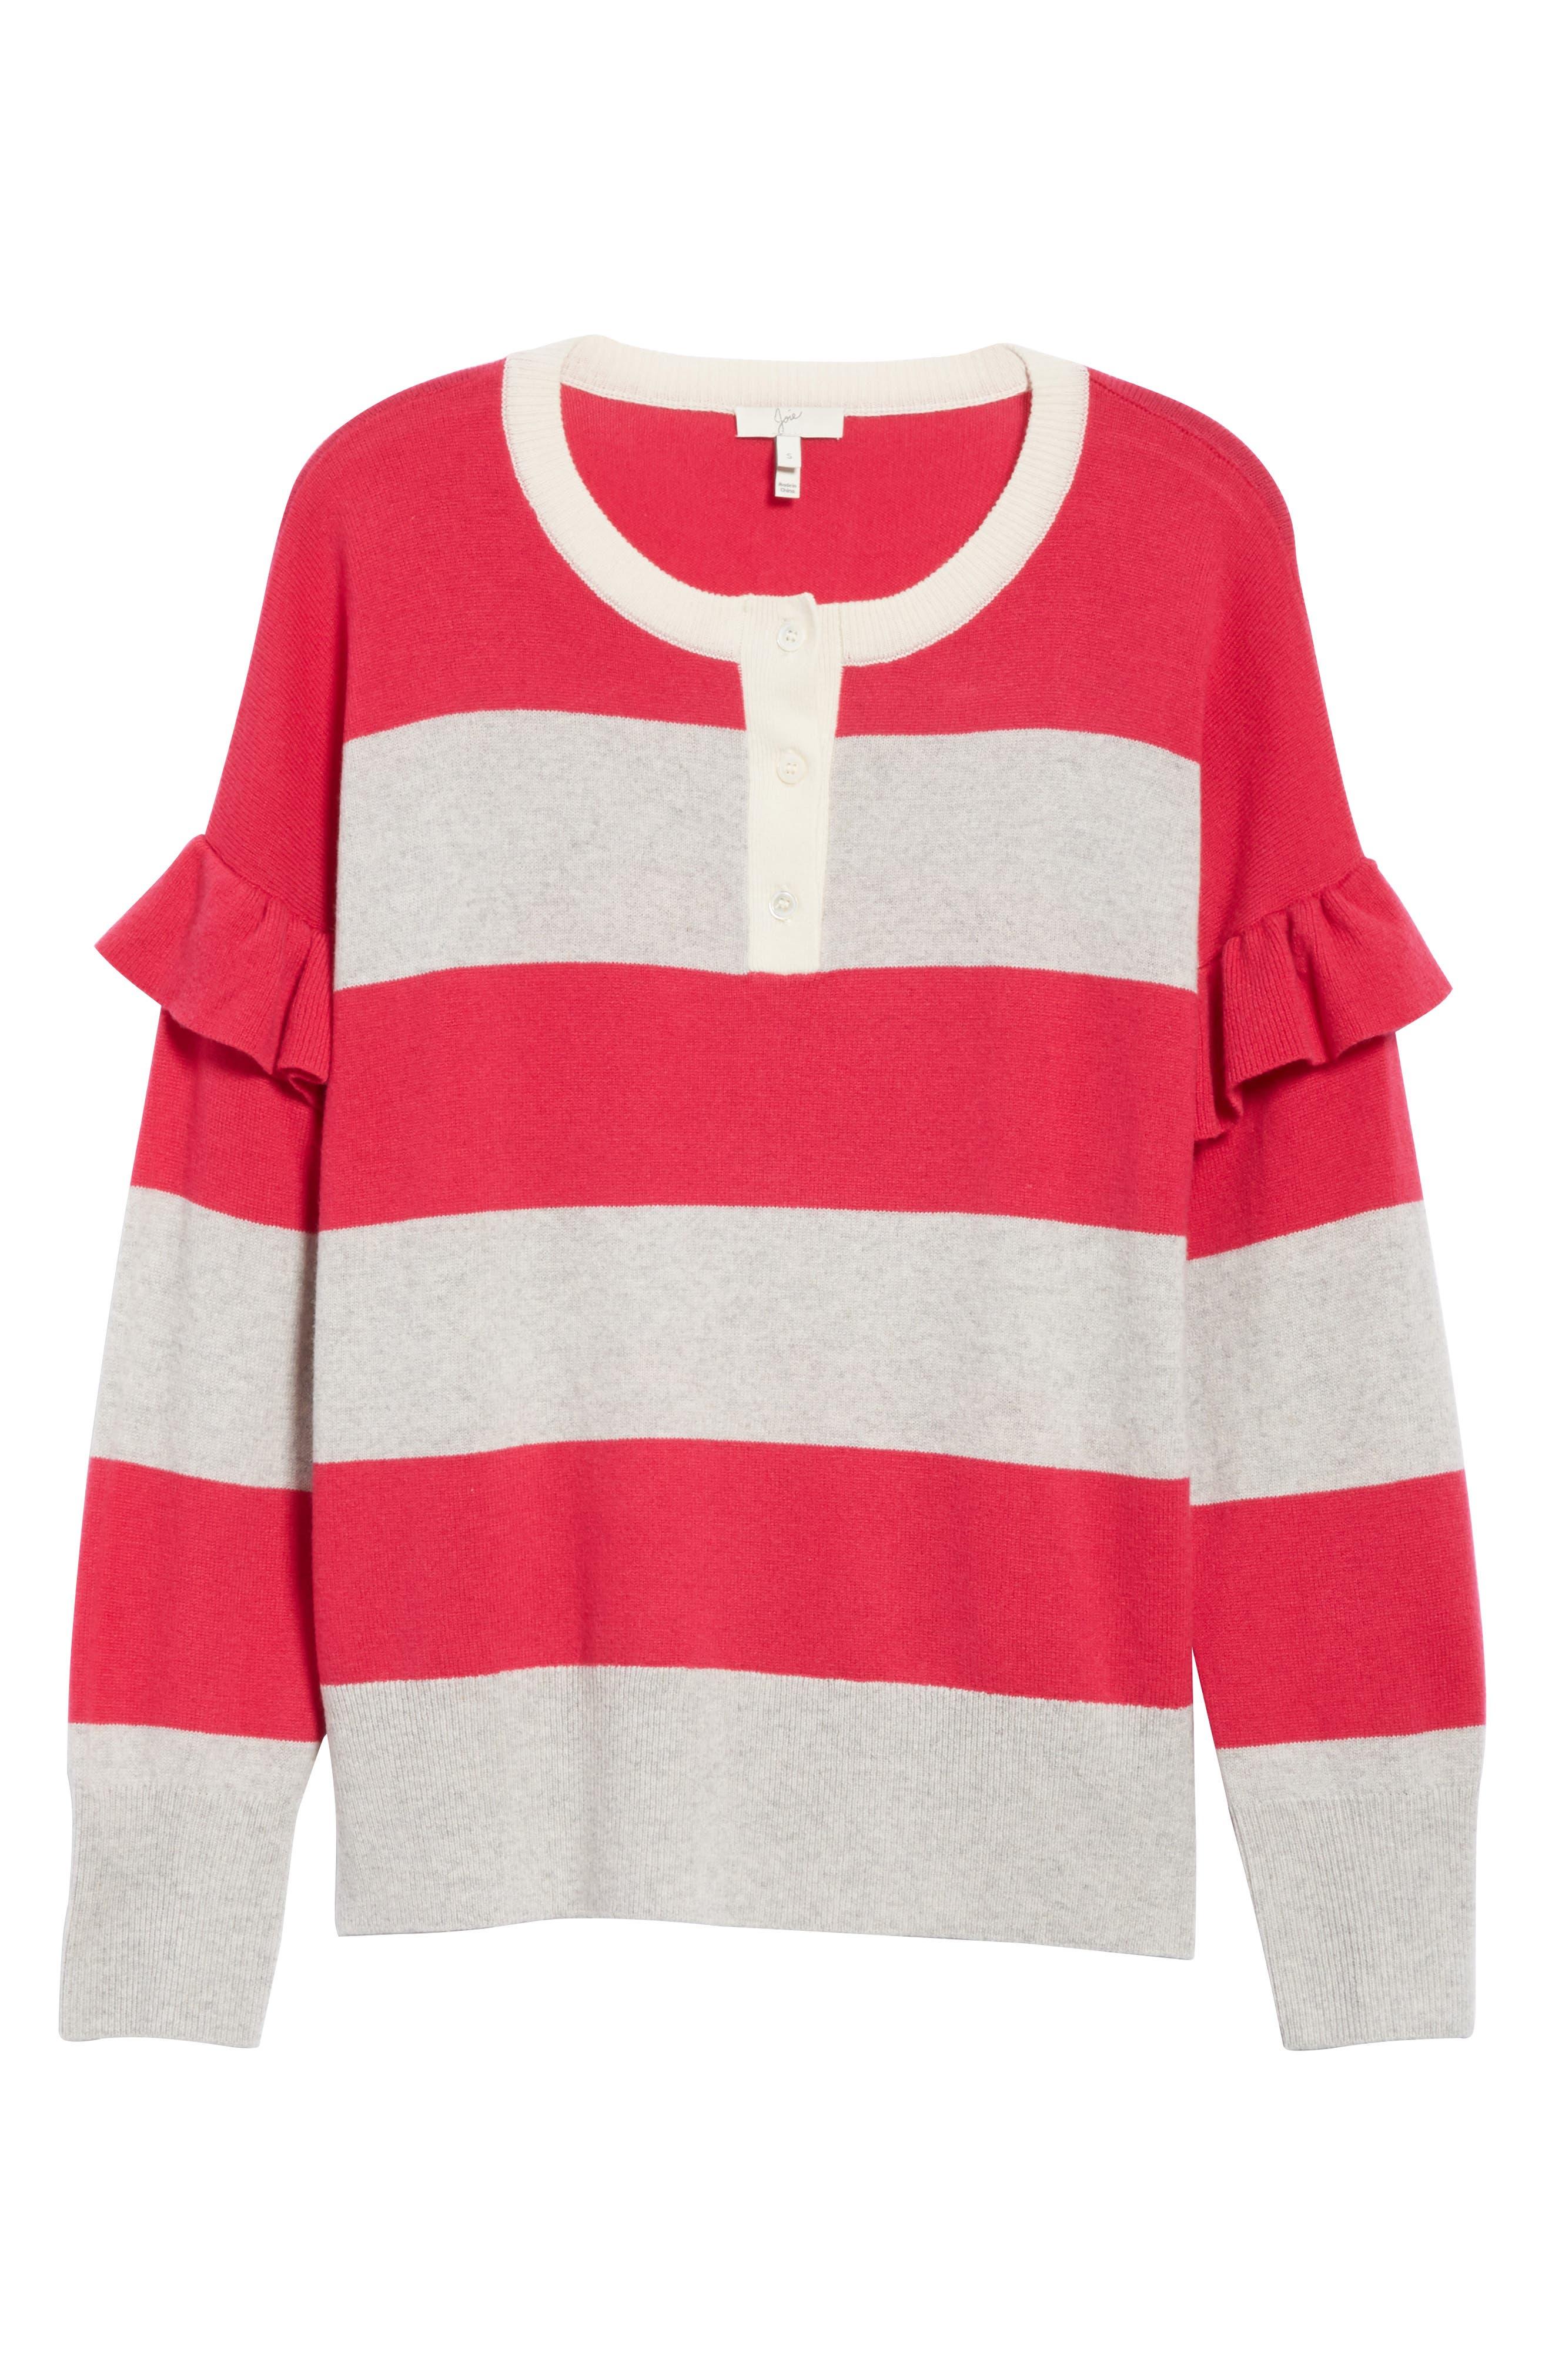 Inghin Stripe Wool & Cashmere Sweater,                             Alternate thumbnail 6, color,                             Hacienda/ Heather Grey